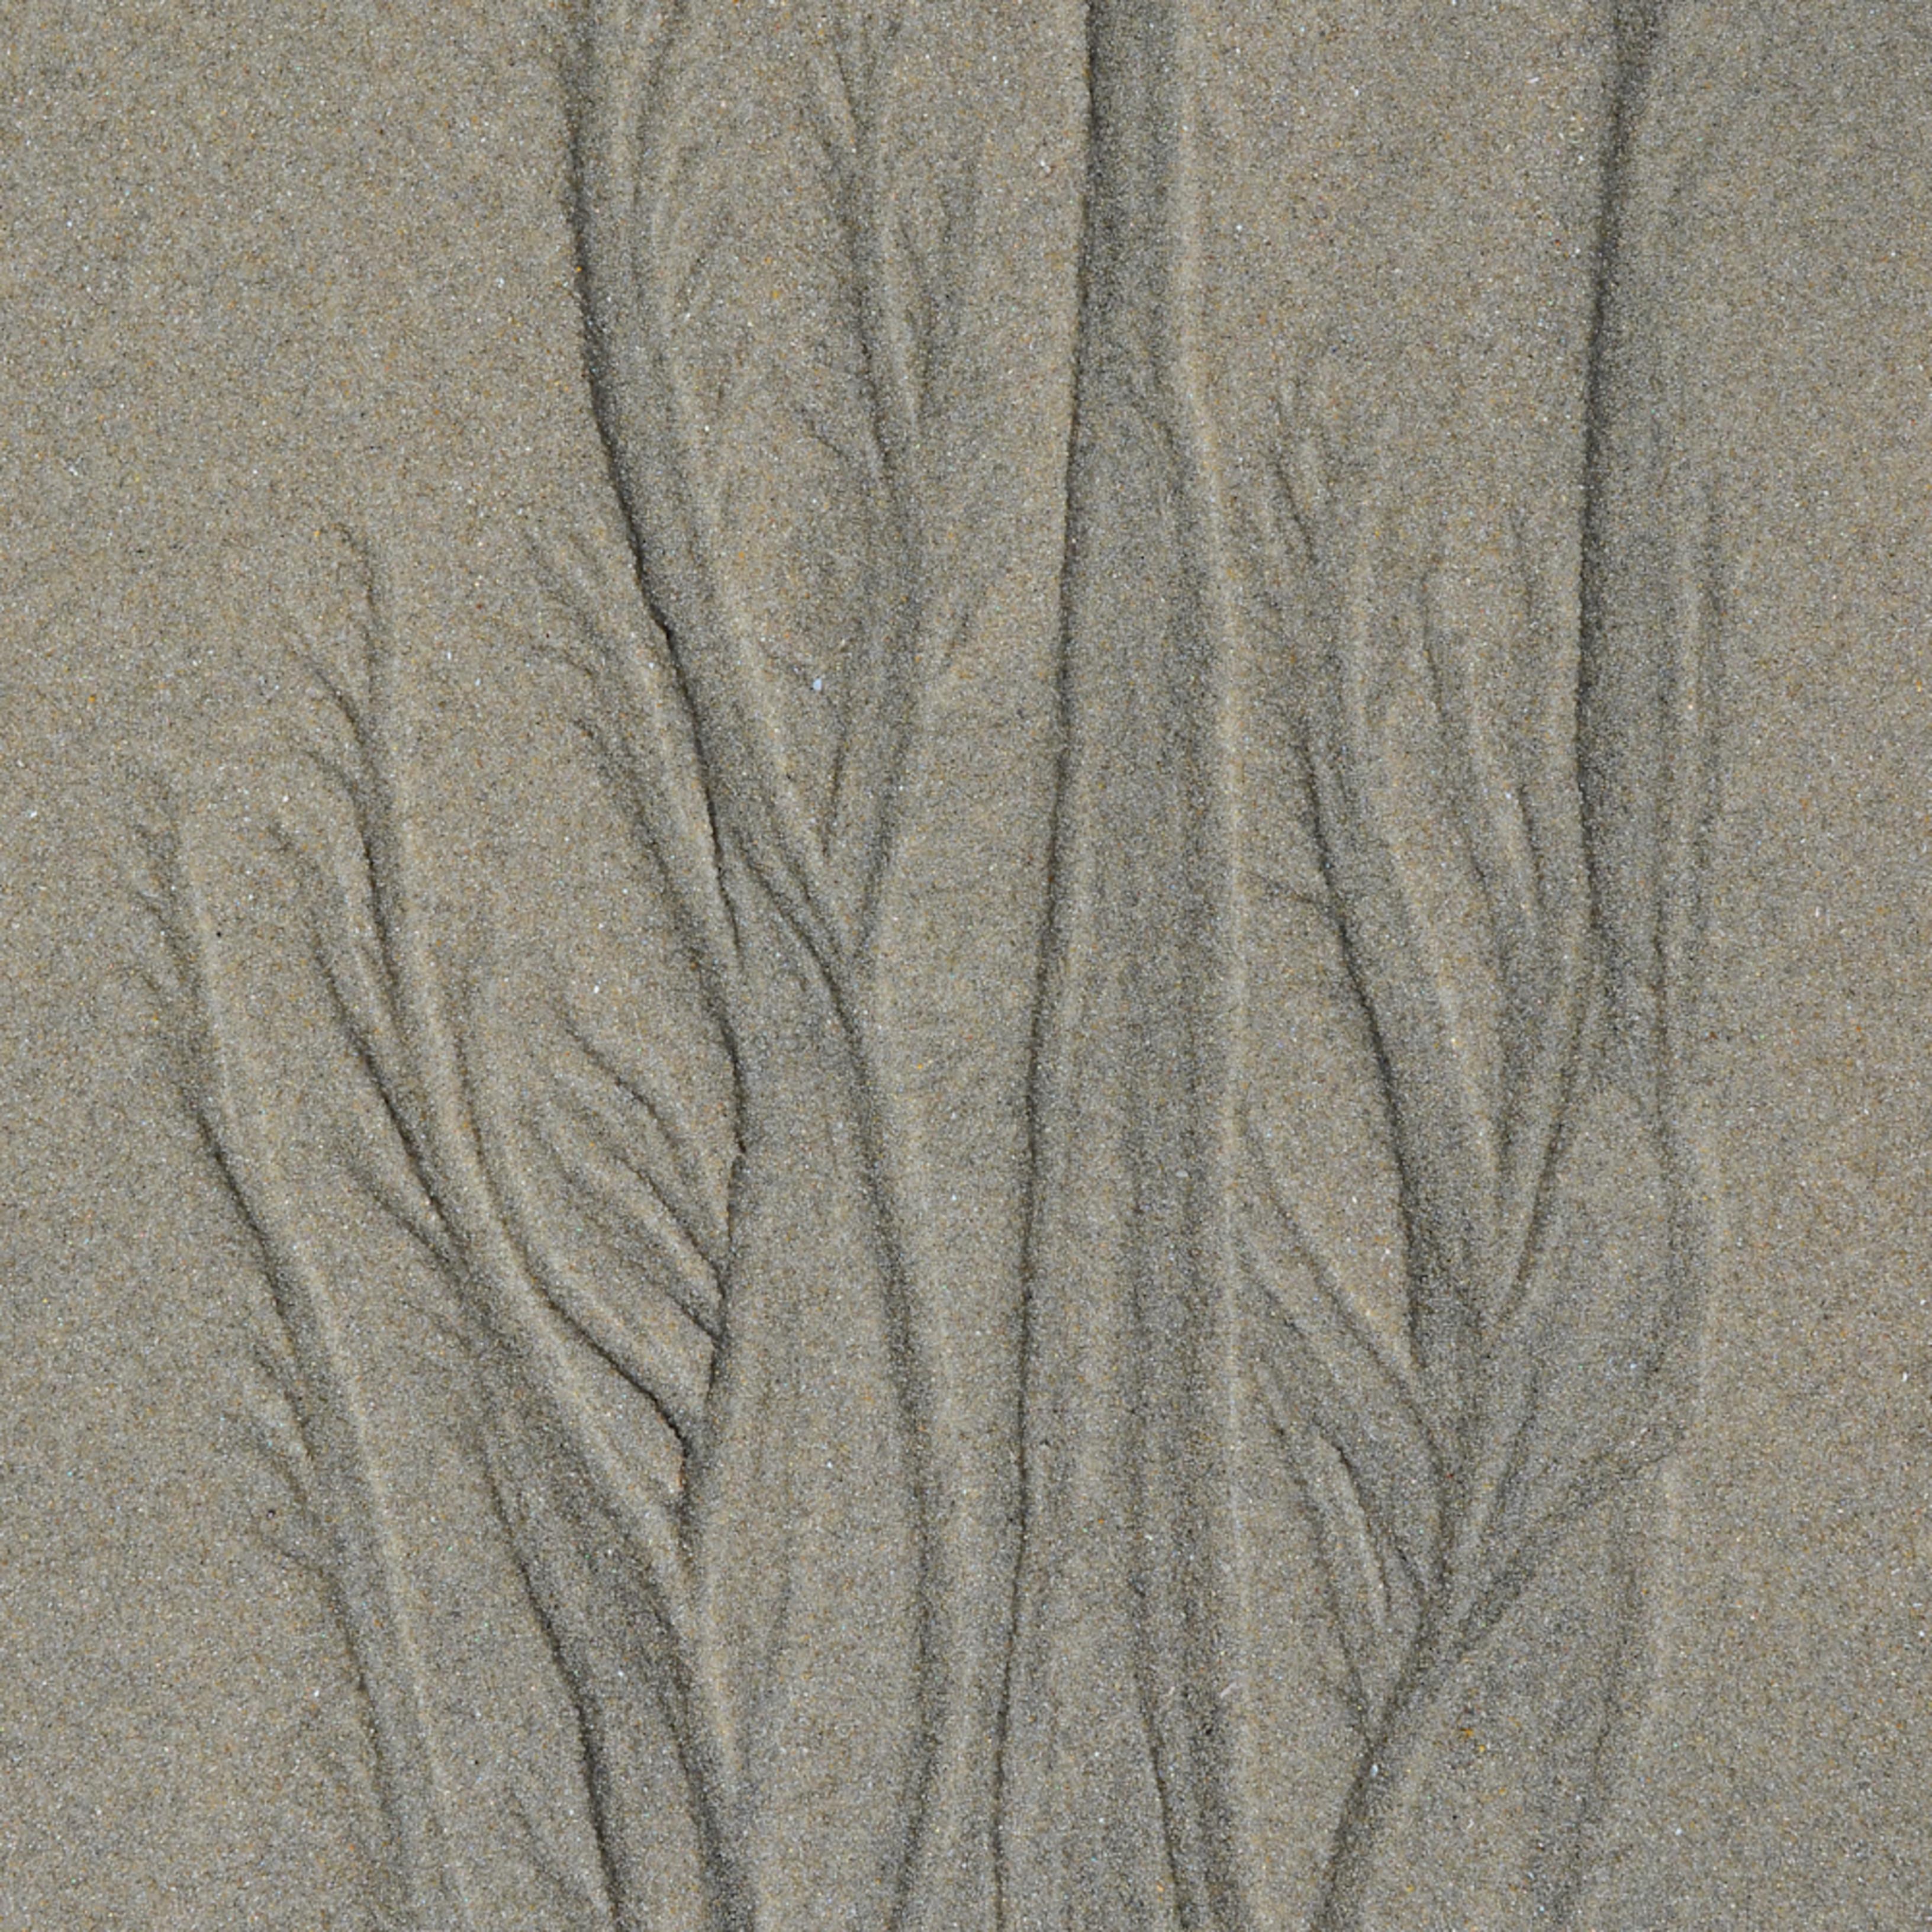 Sandpattern6 gumbi8